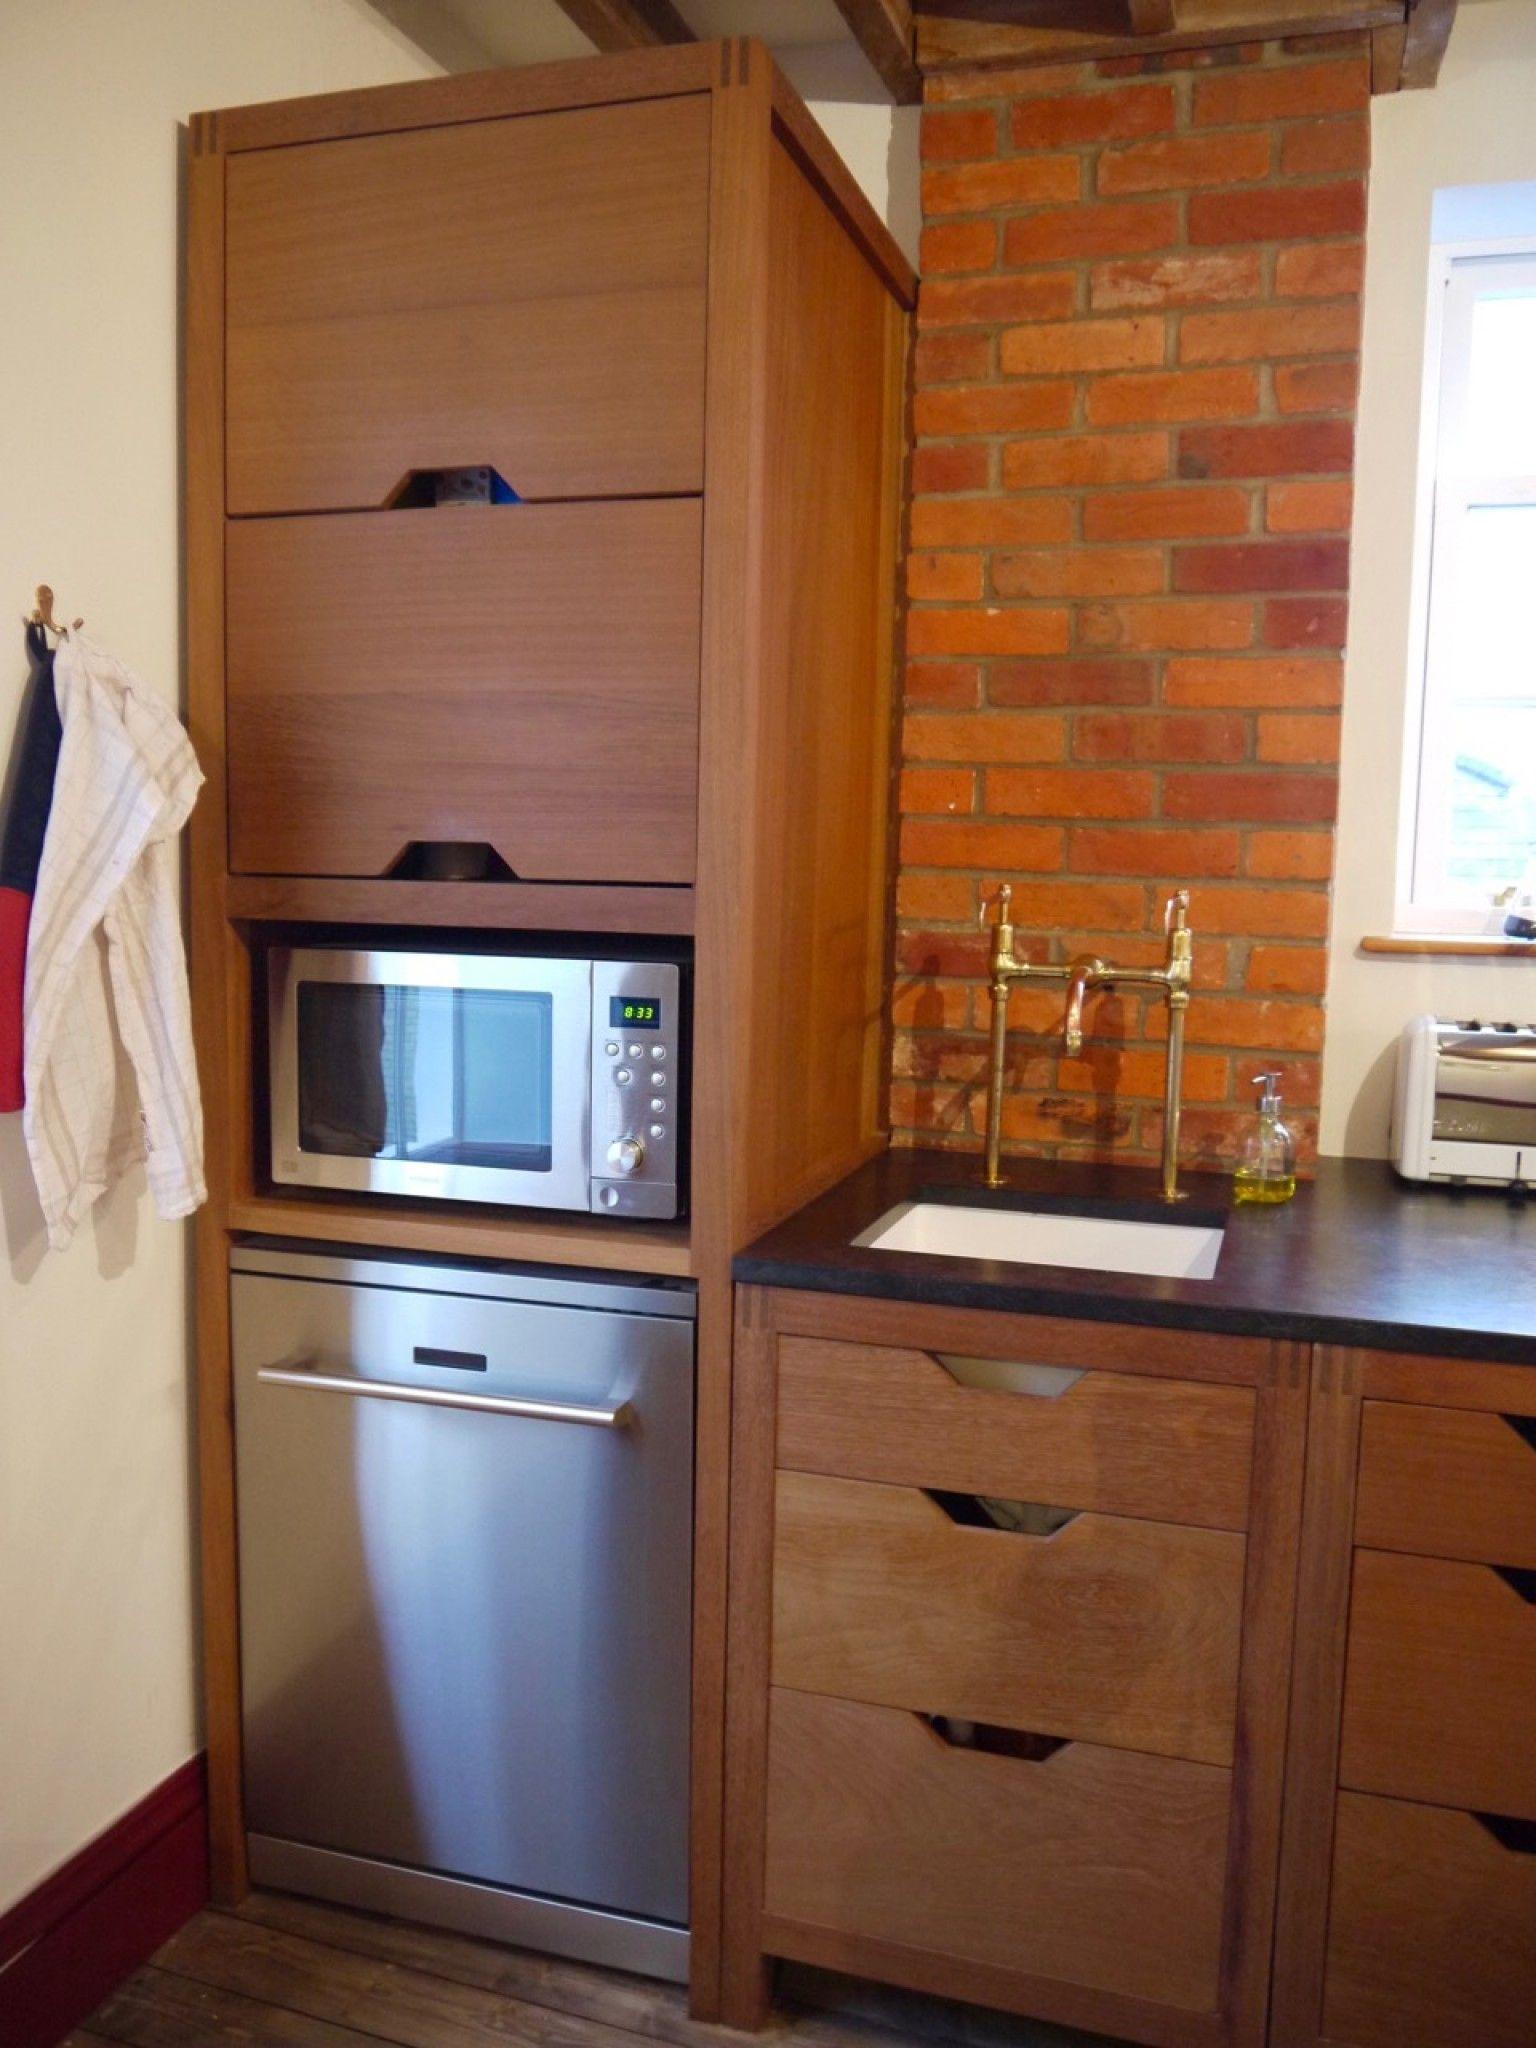 Pin On Mahogany Or Teak Kitchen Cabinets